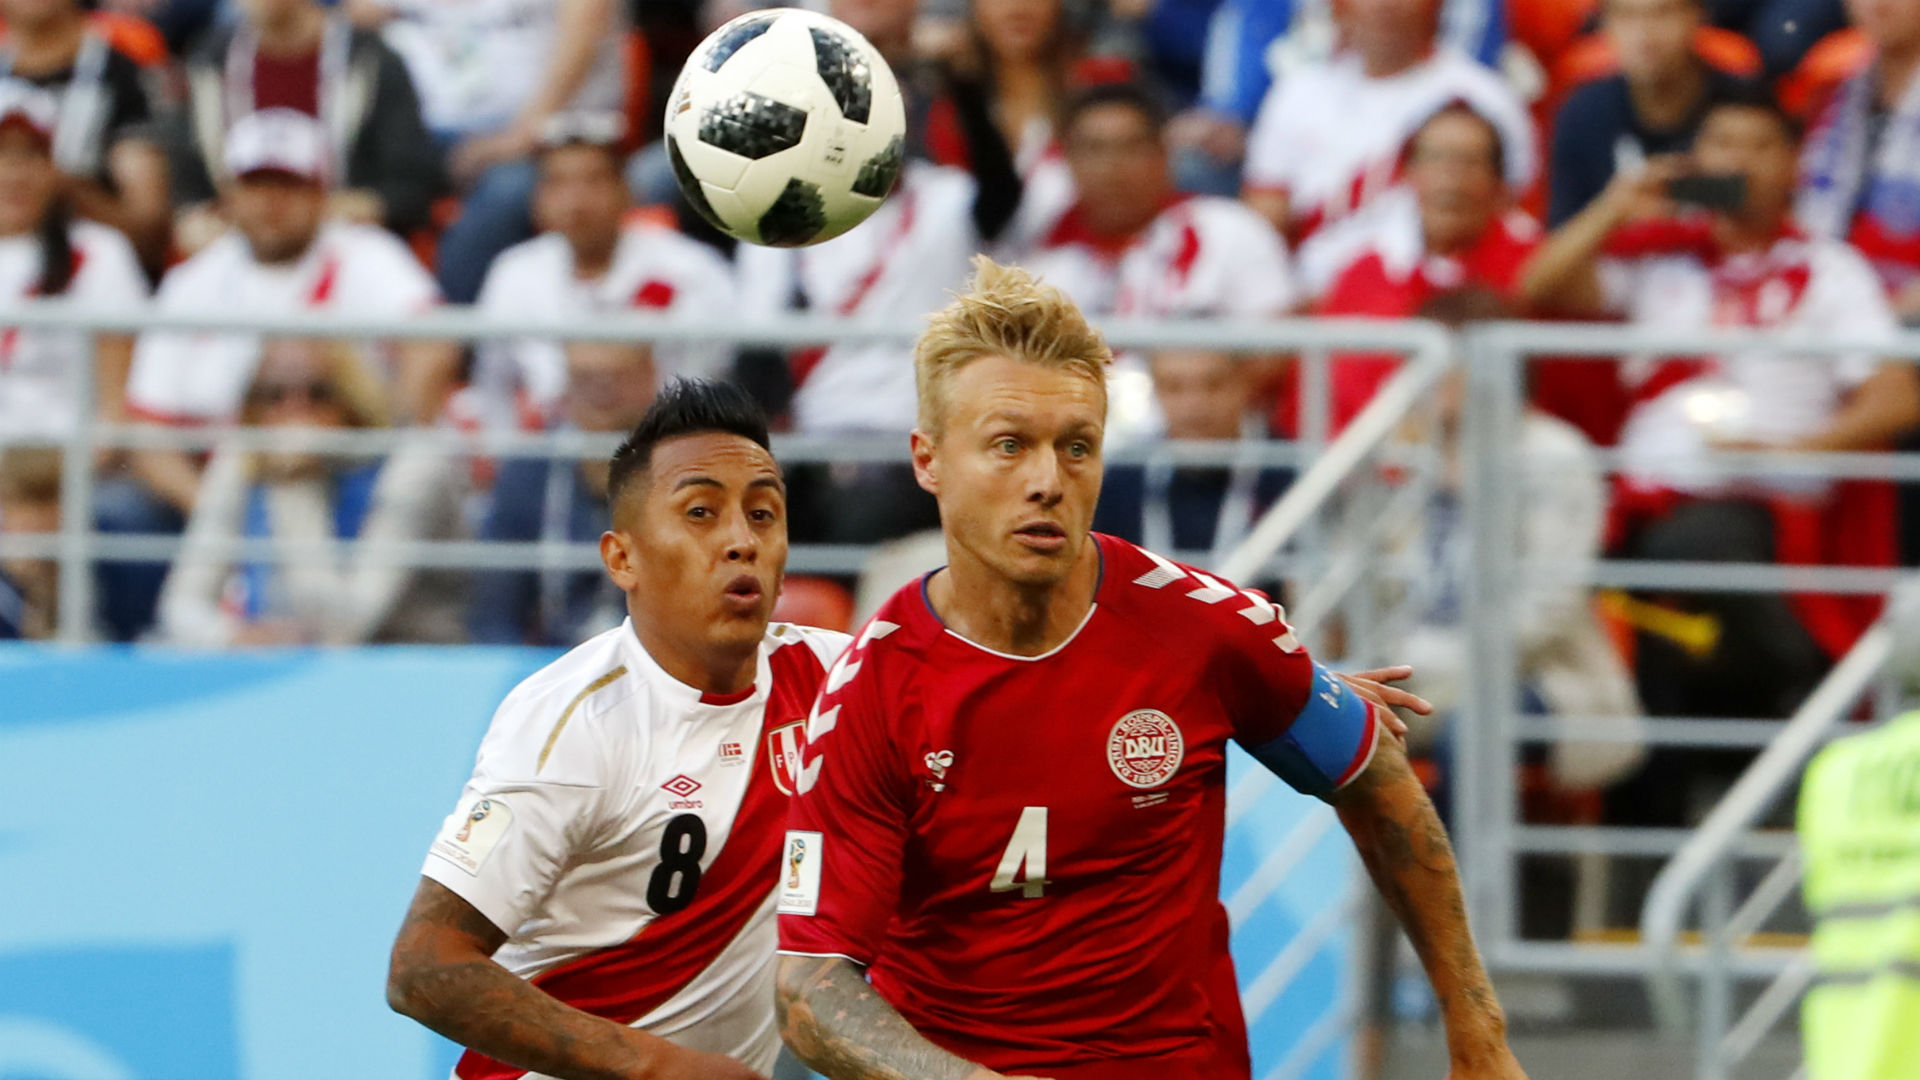 Christian Cueva Peru Denmark Dinamarca World Cup Mundial 2018